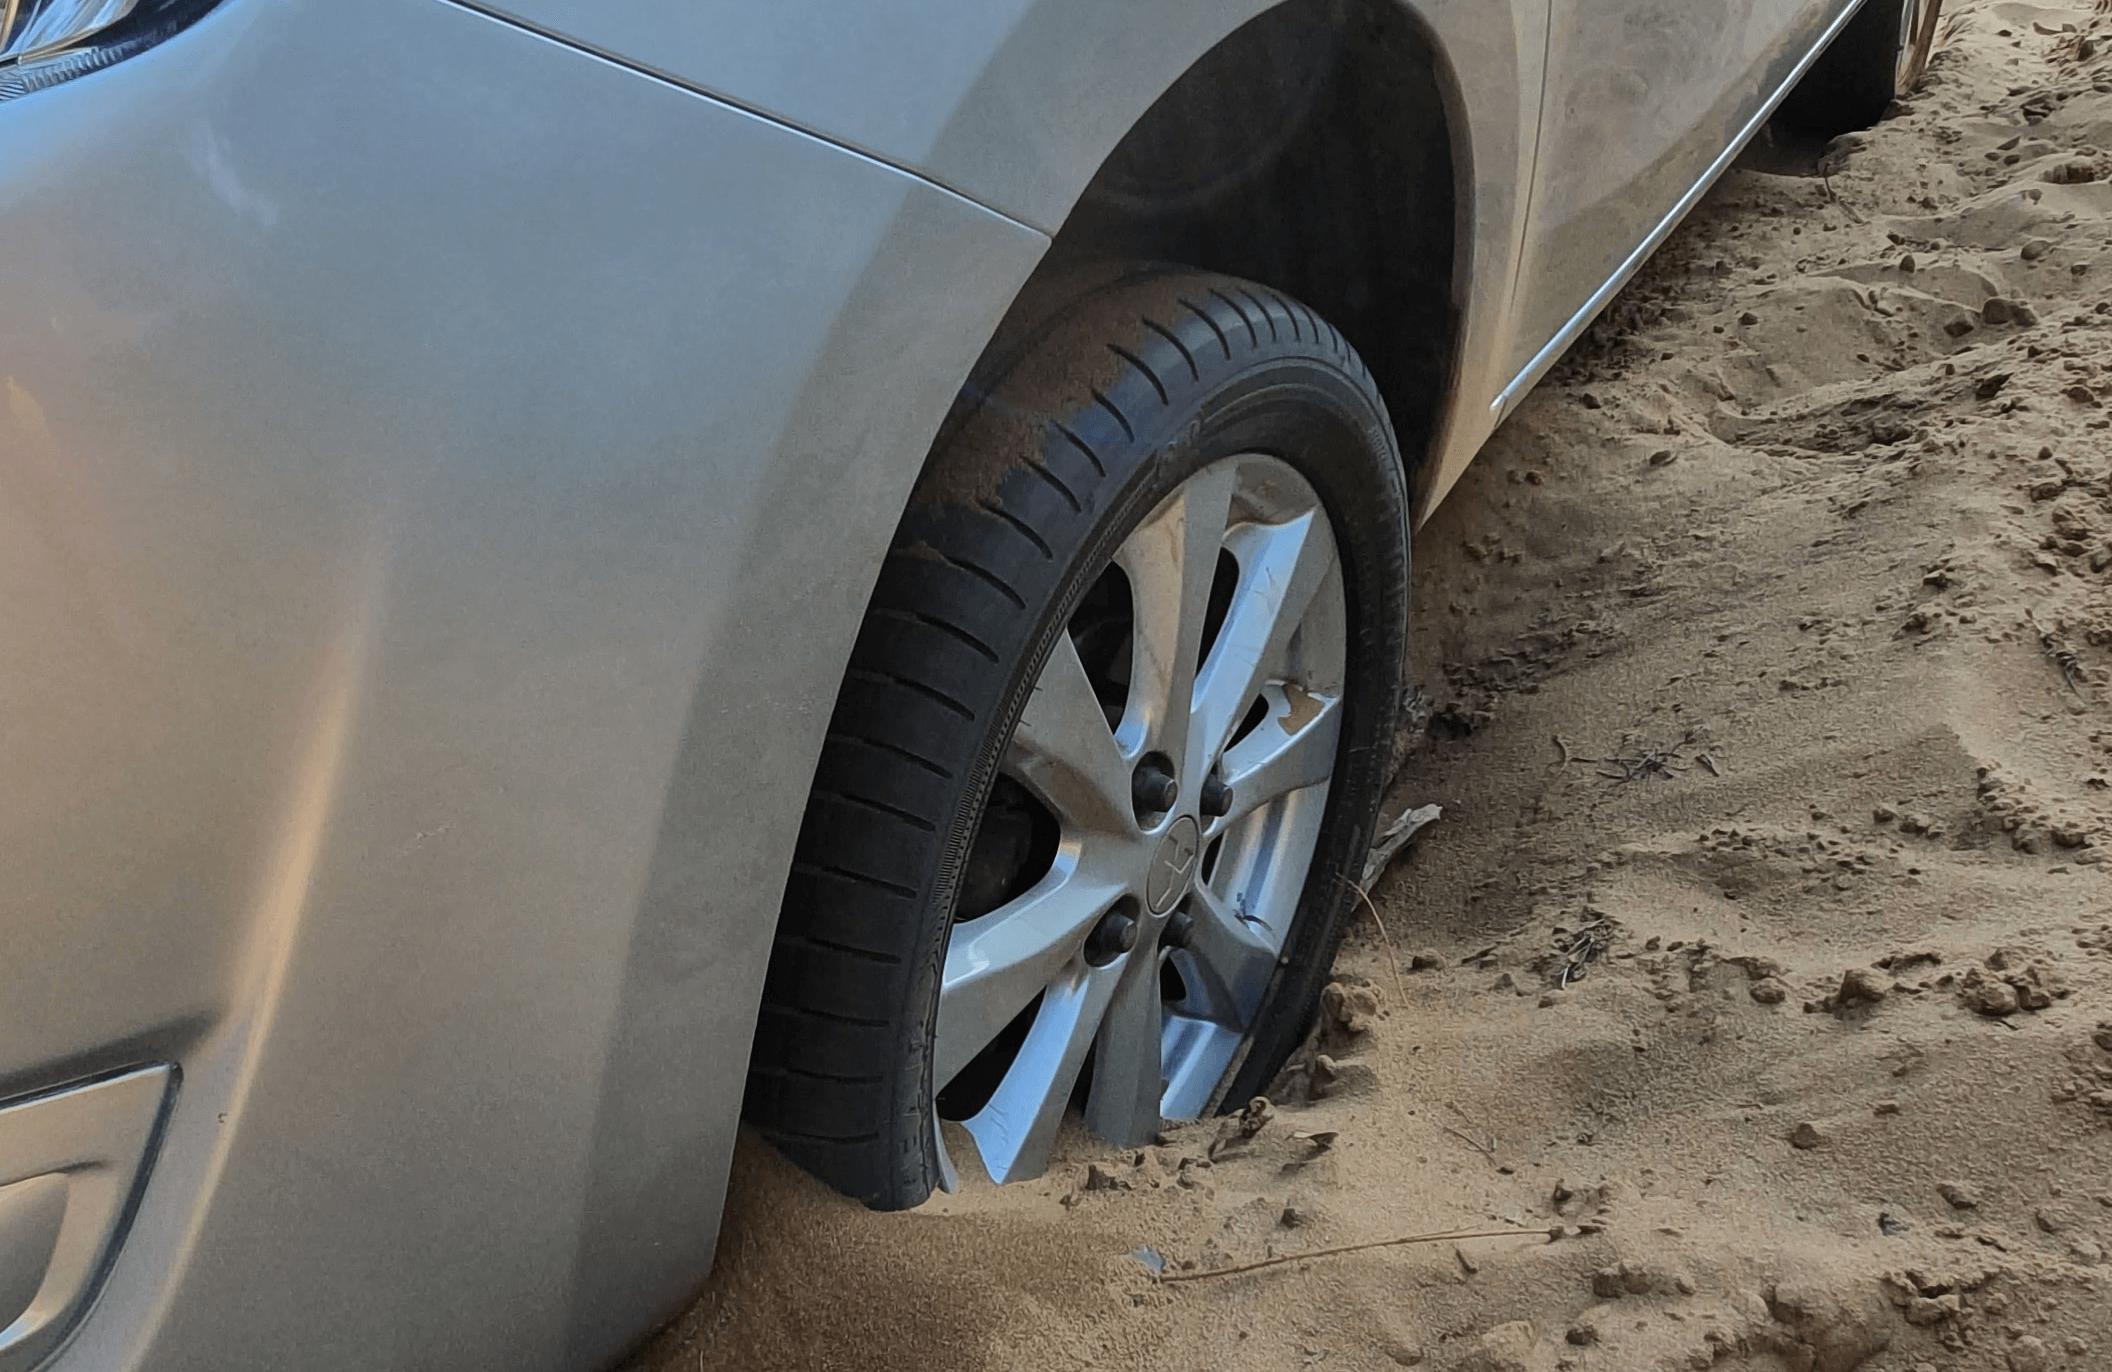 Vehicle Stuck in sand